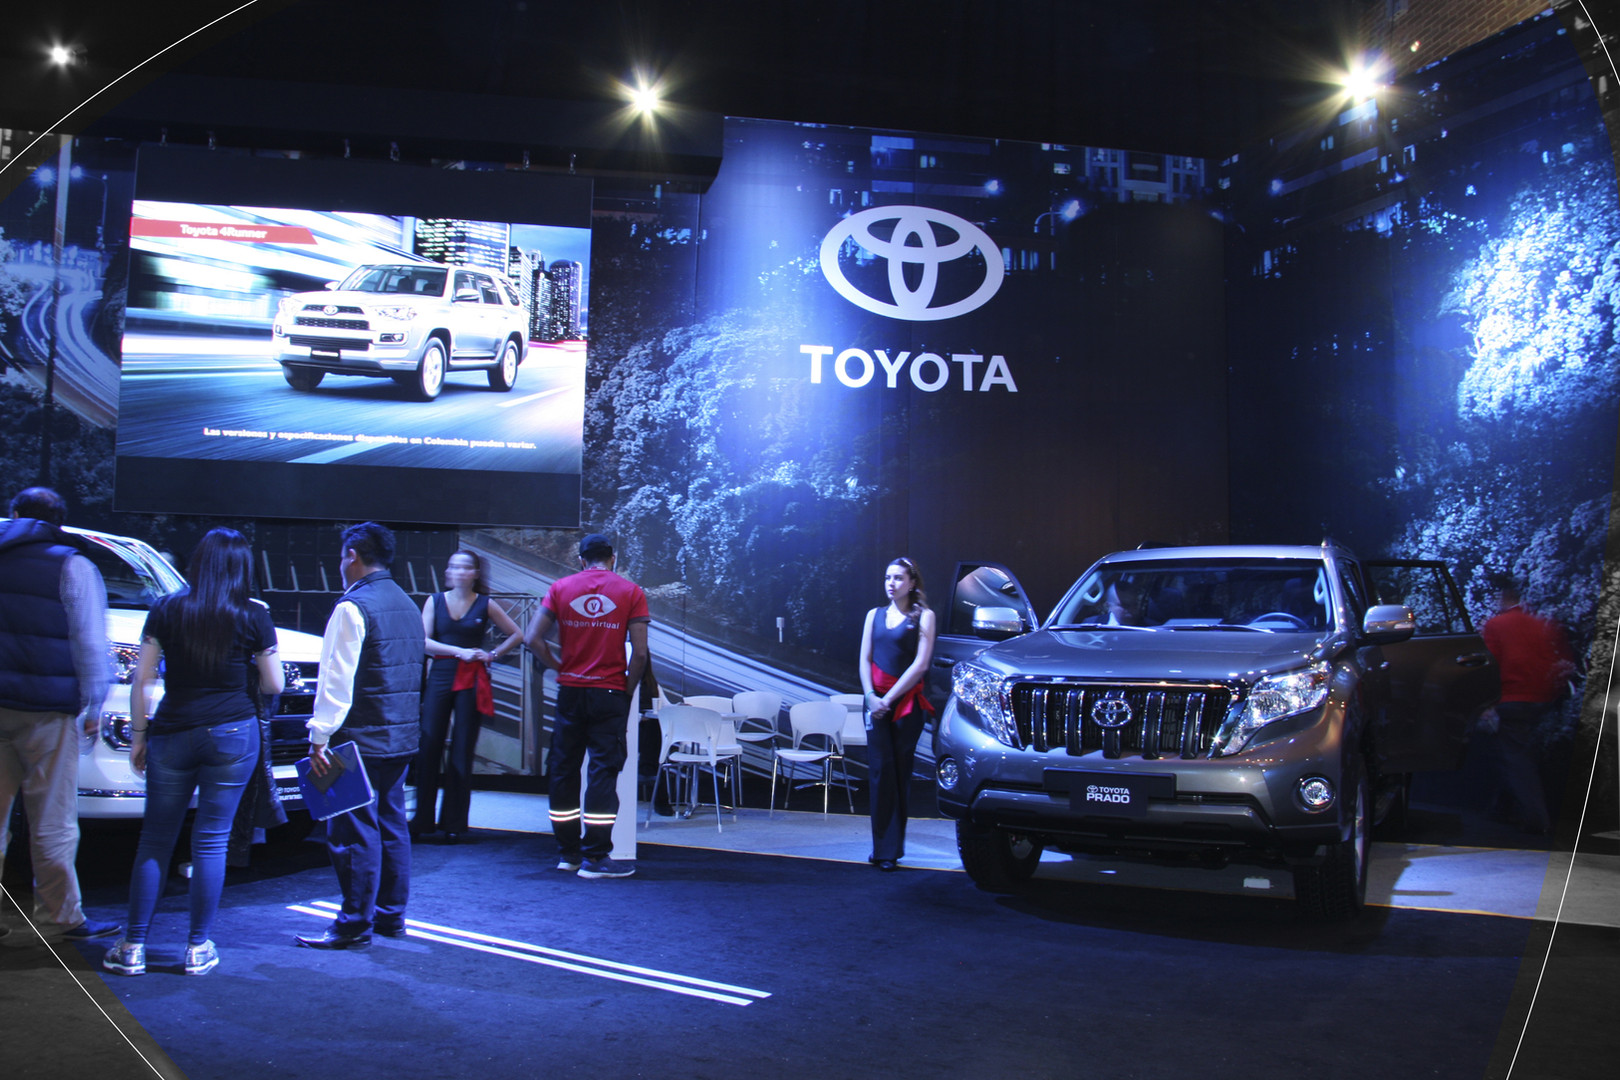 Toyota IMG_8221.JPG